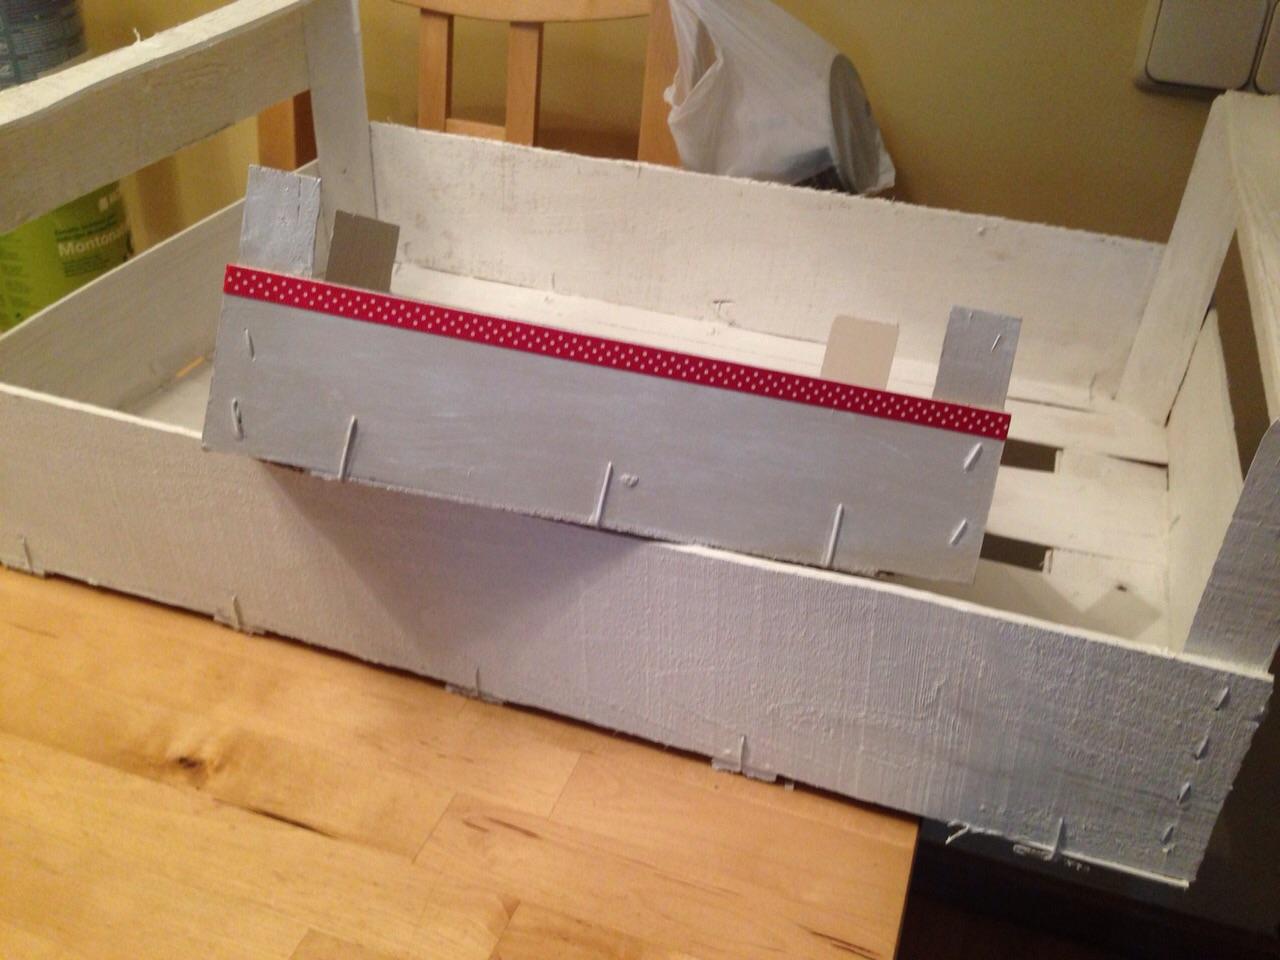 Manualidades manualidades decorar cajas de madera - Manualidades con caja de madera ...